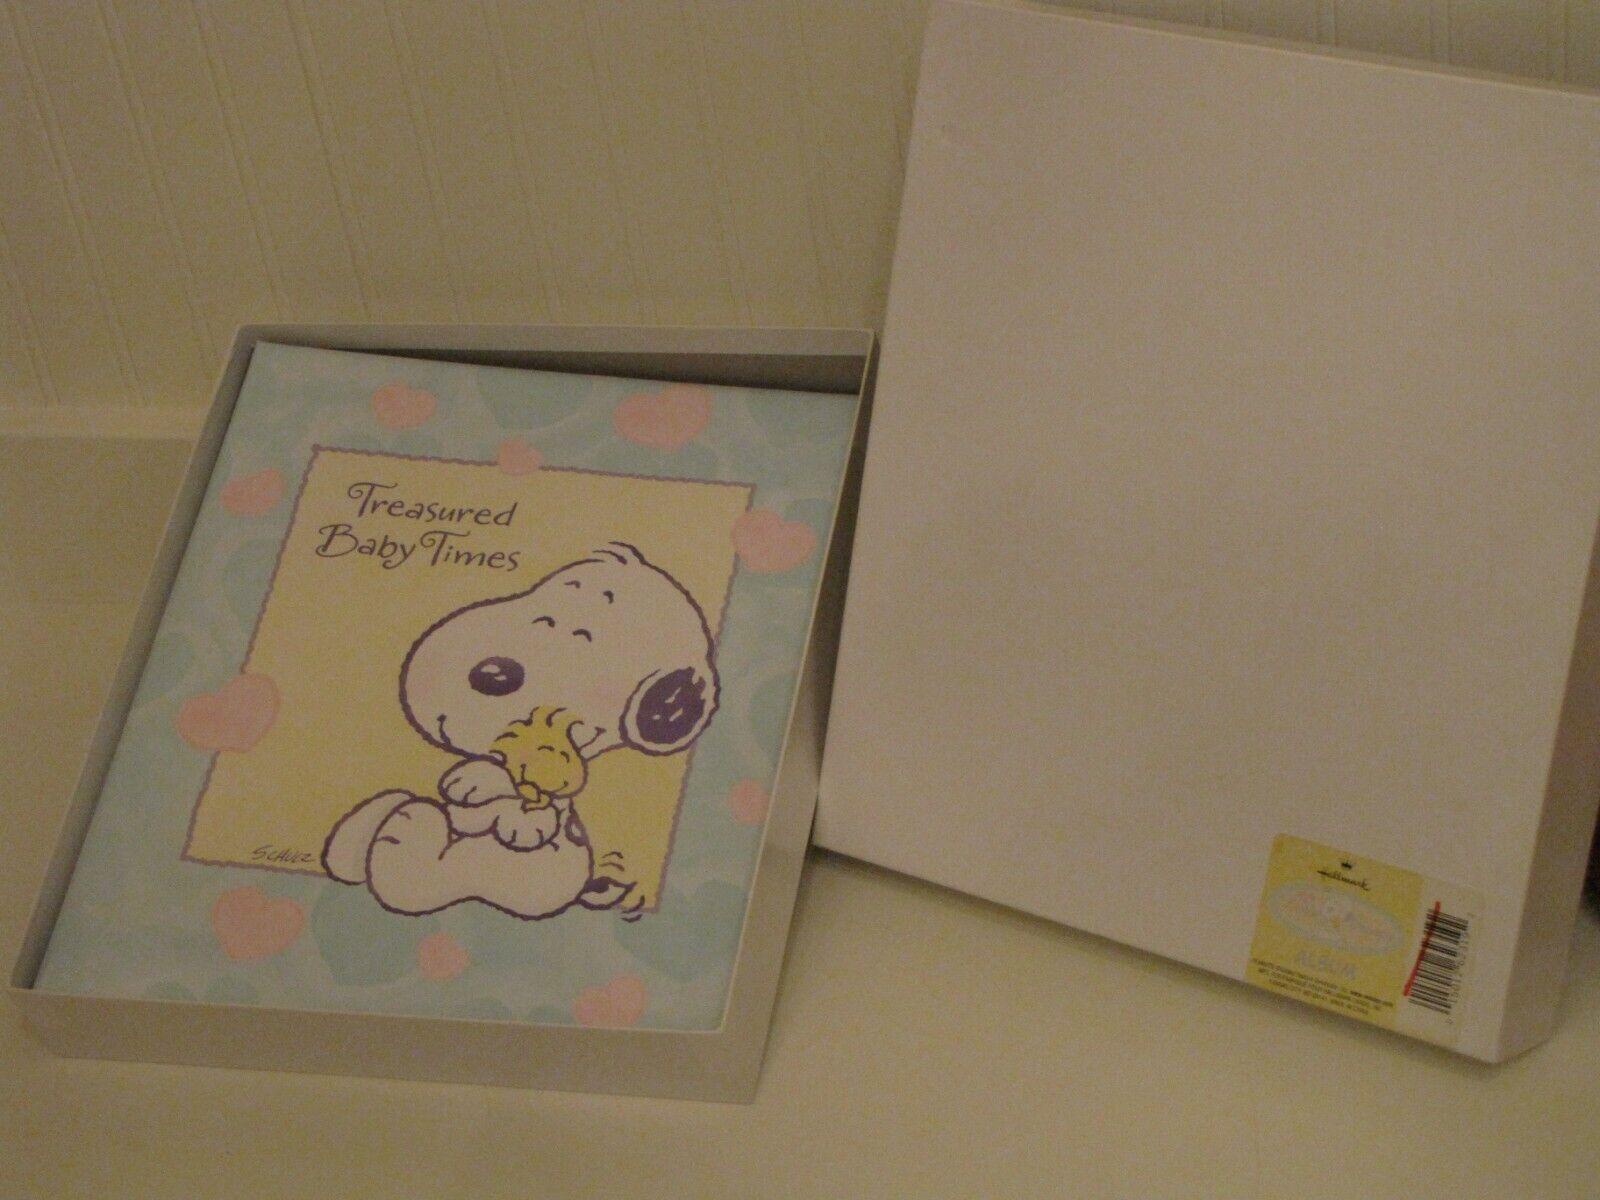 NEW HALLMARK BABY SNOOPY 3 RING MEMORY KEEPSAKE BOOK TREASURED BABY TIMES  - $23.95